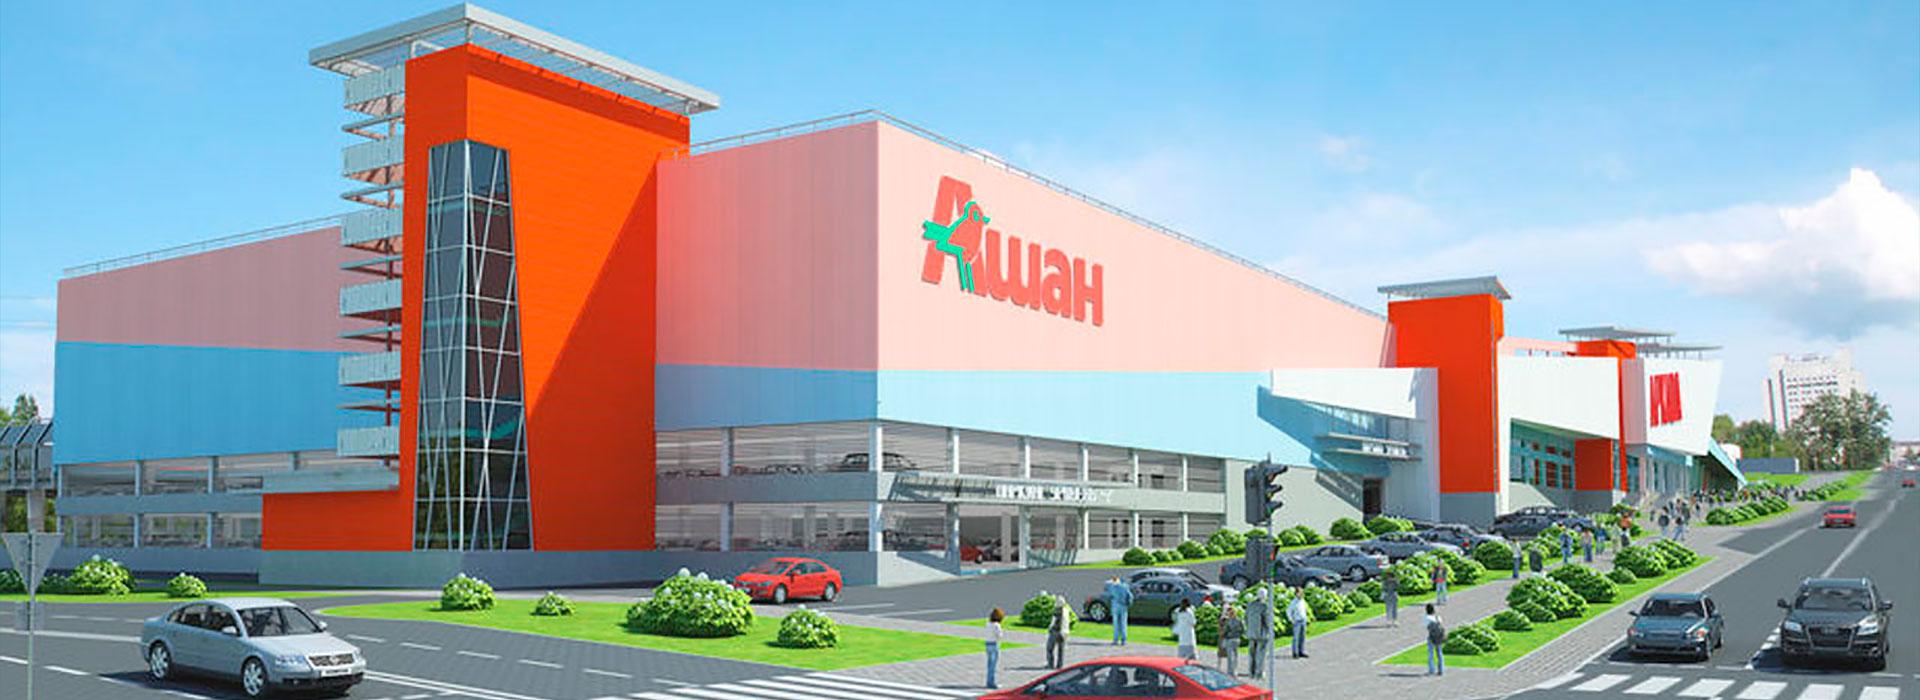 Сотрудничество с Ашан (Auchan)